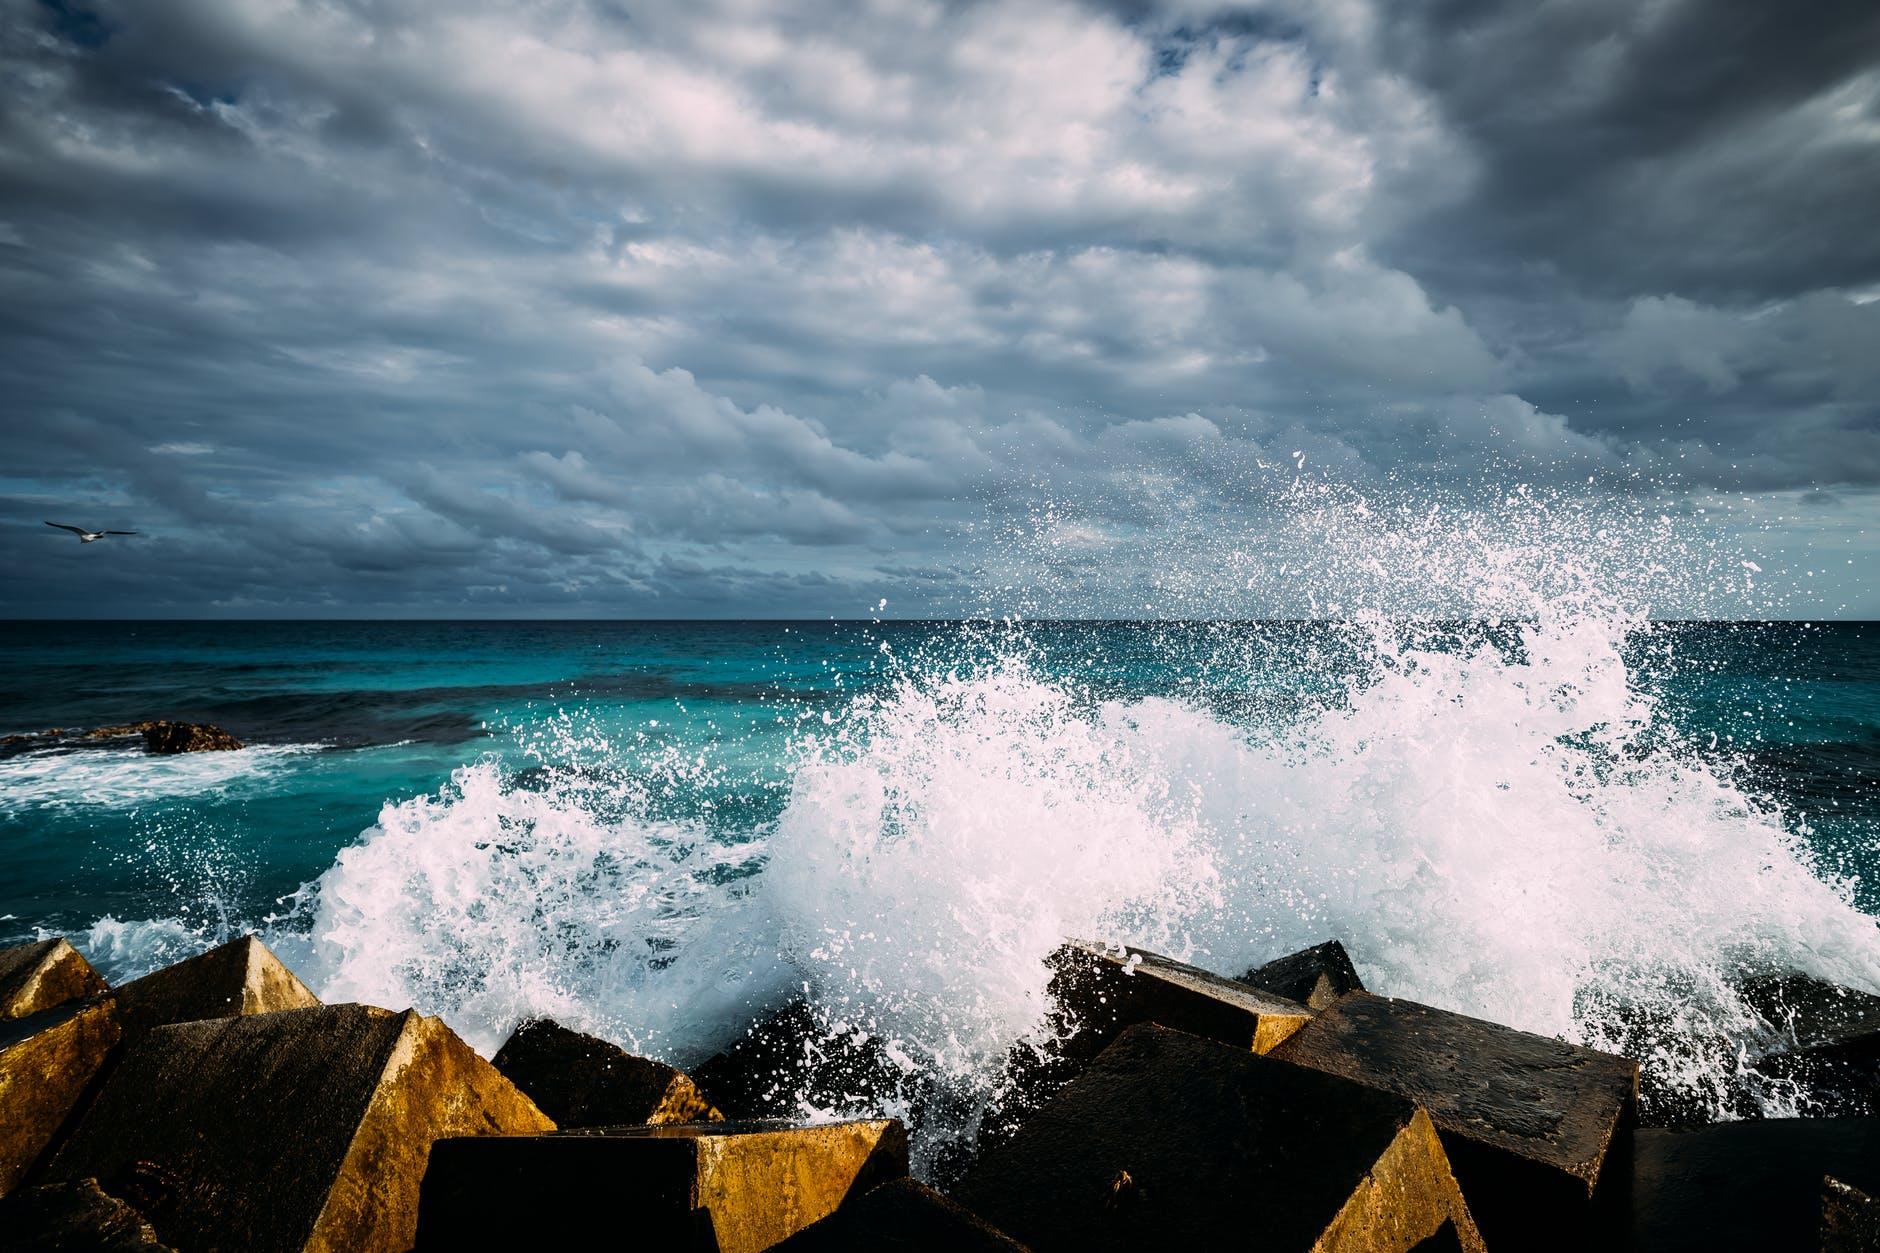 crash foam ocean rocks